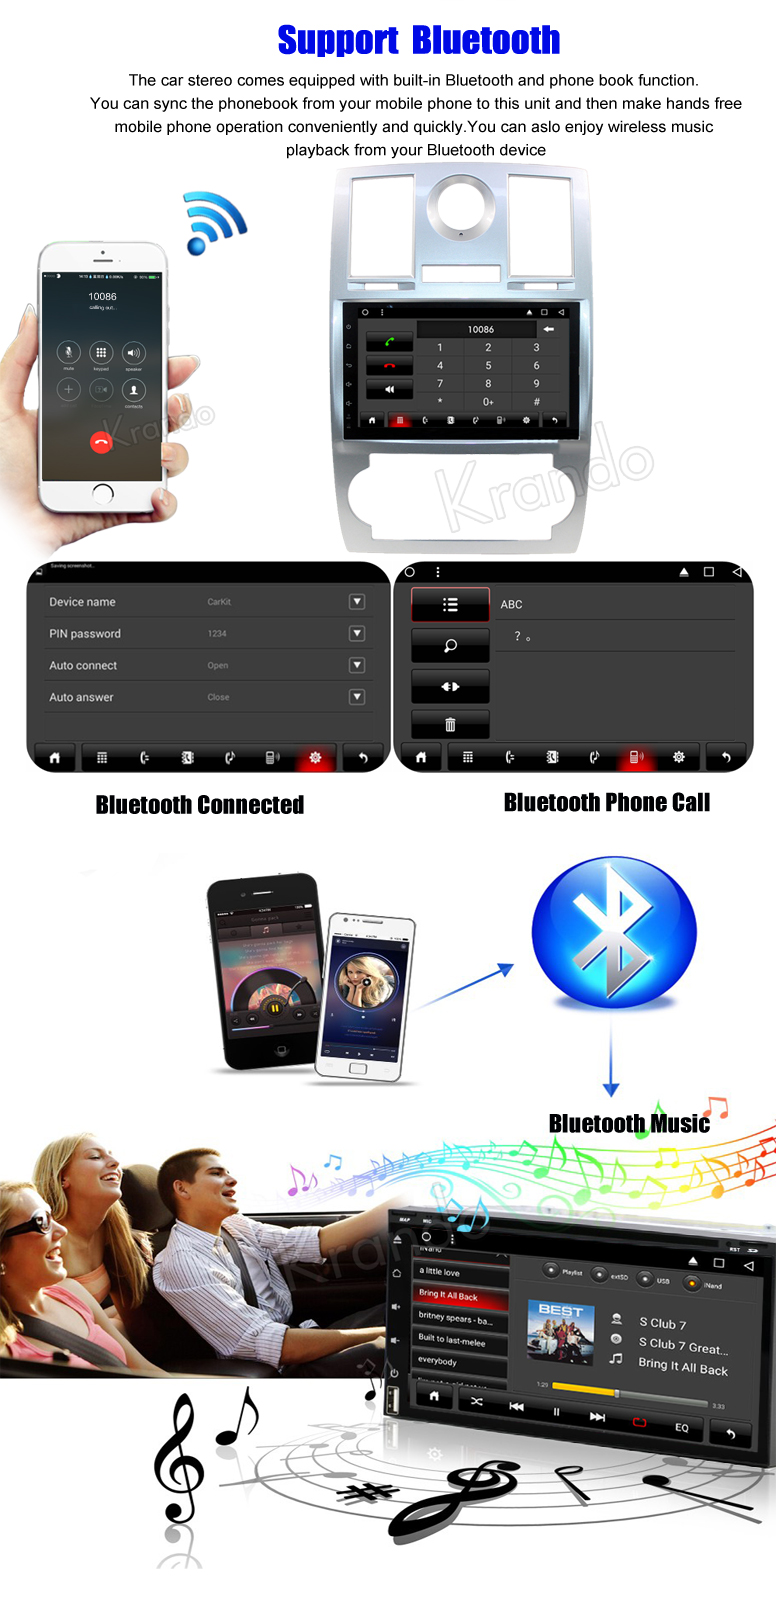 Autoradio Krando Android 8 1 9'' per chrysler 300c android audio wifi 3G  playstore bluetooth